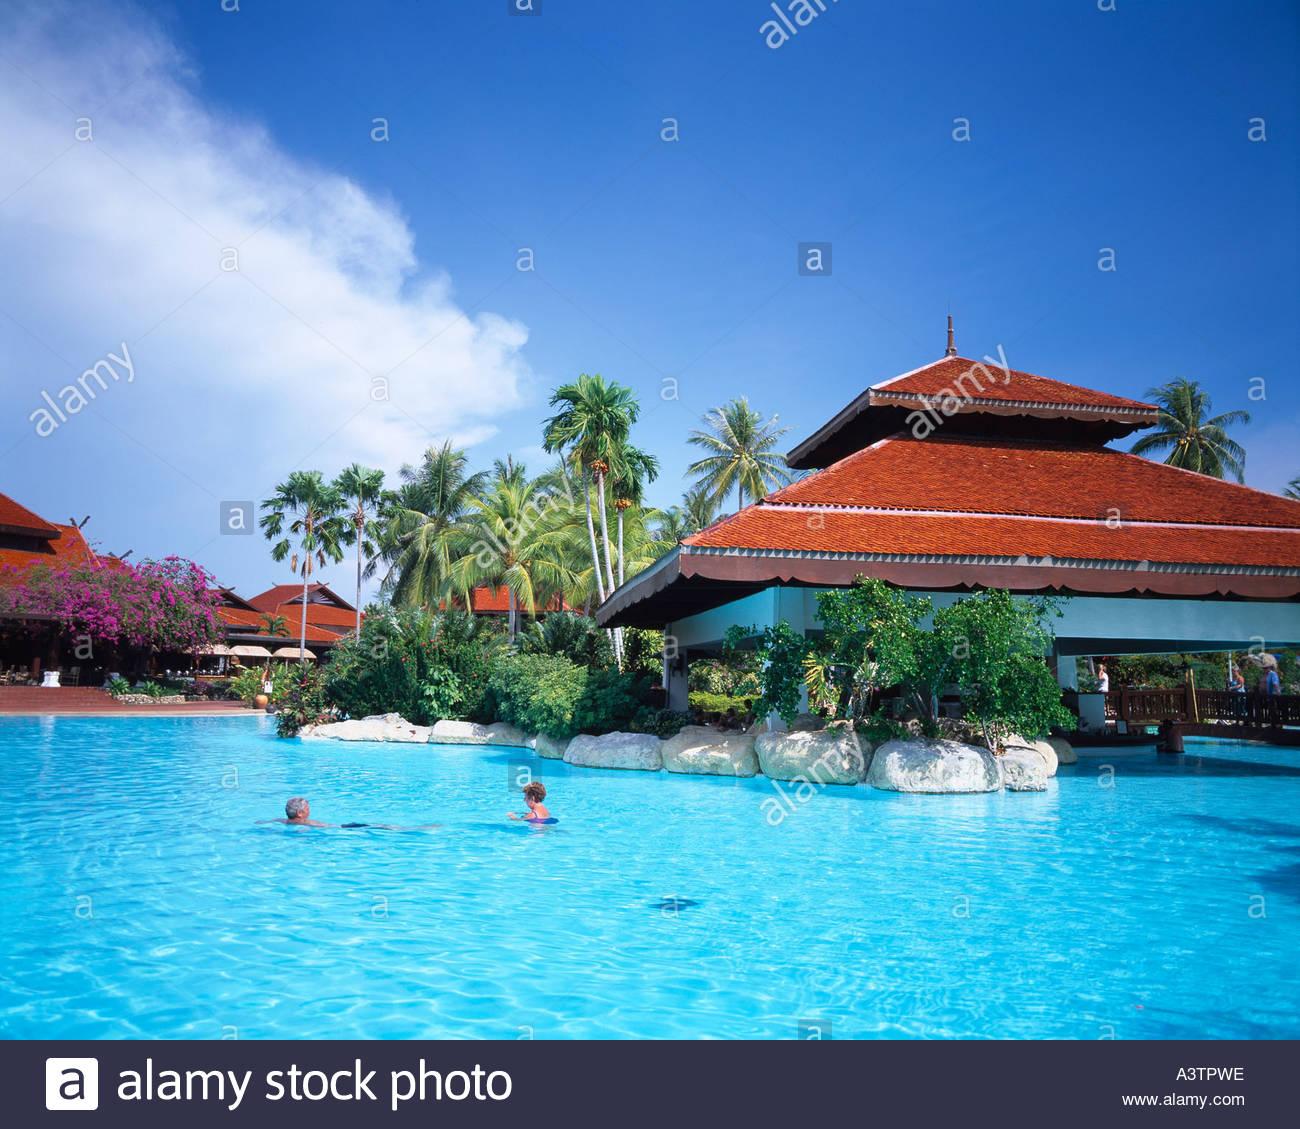 Malaysia Beach Resorts: Pelangi Beach Resort Pool Langkawi Island Malaysia Blue